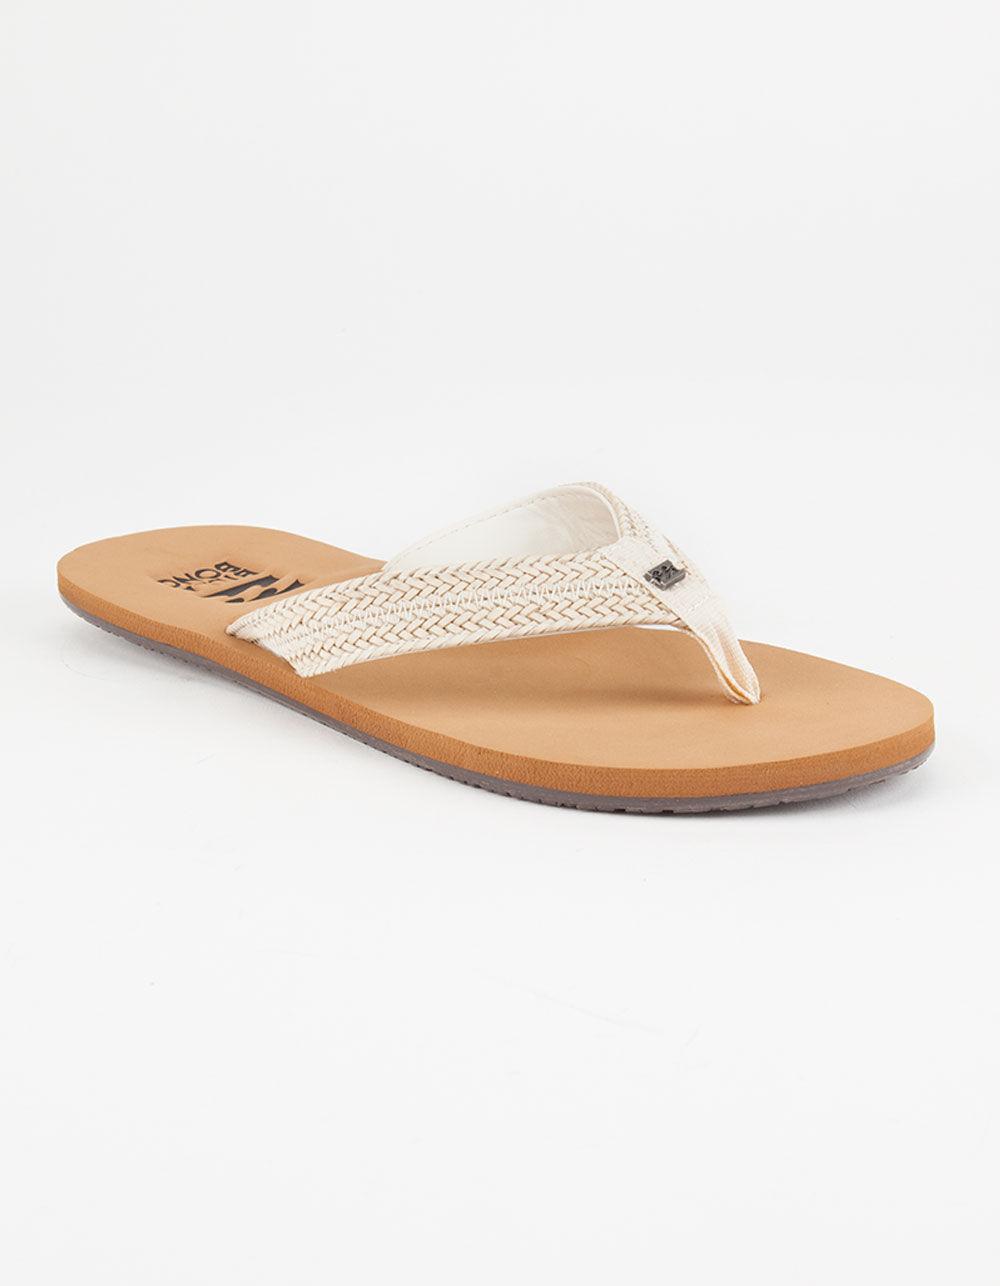 BILLABONG Kai Natural Sandals